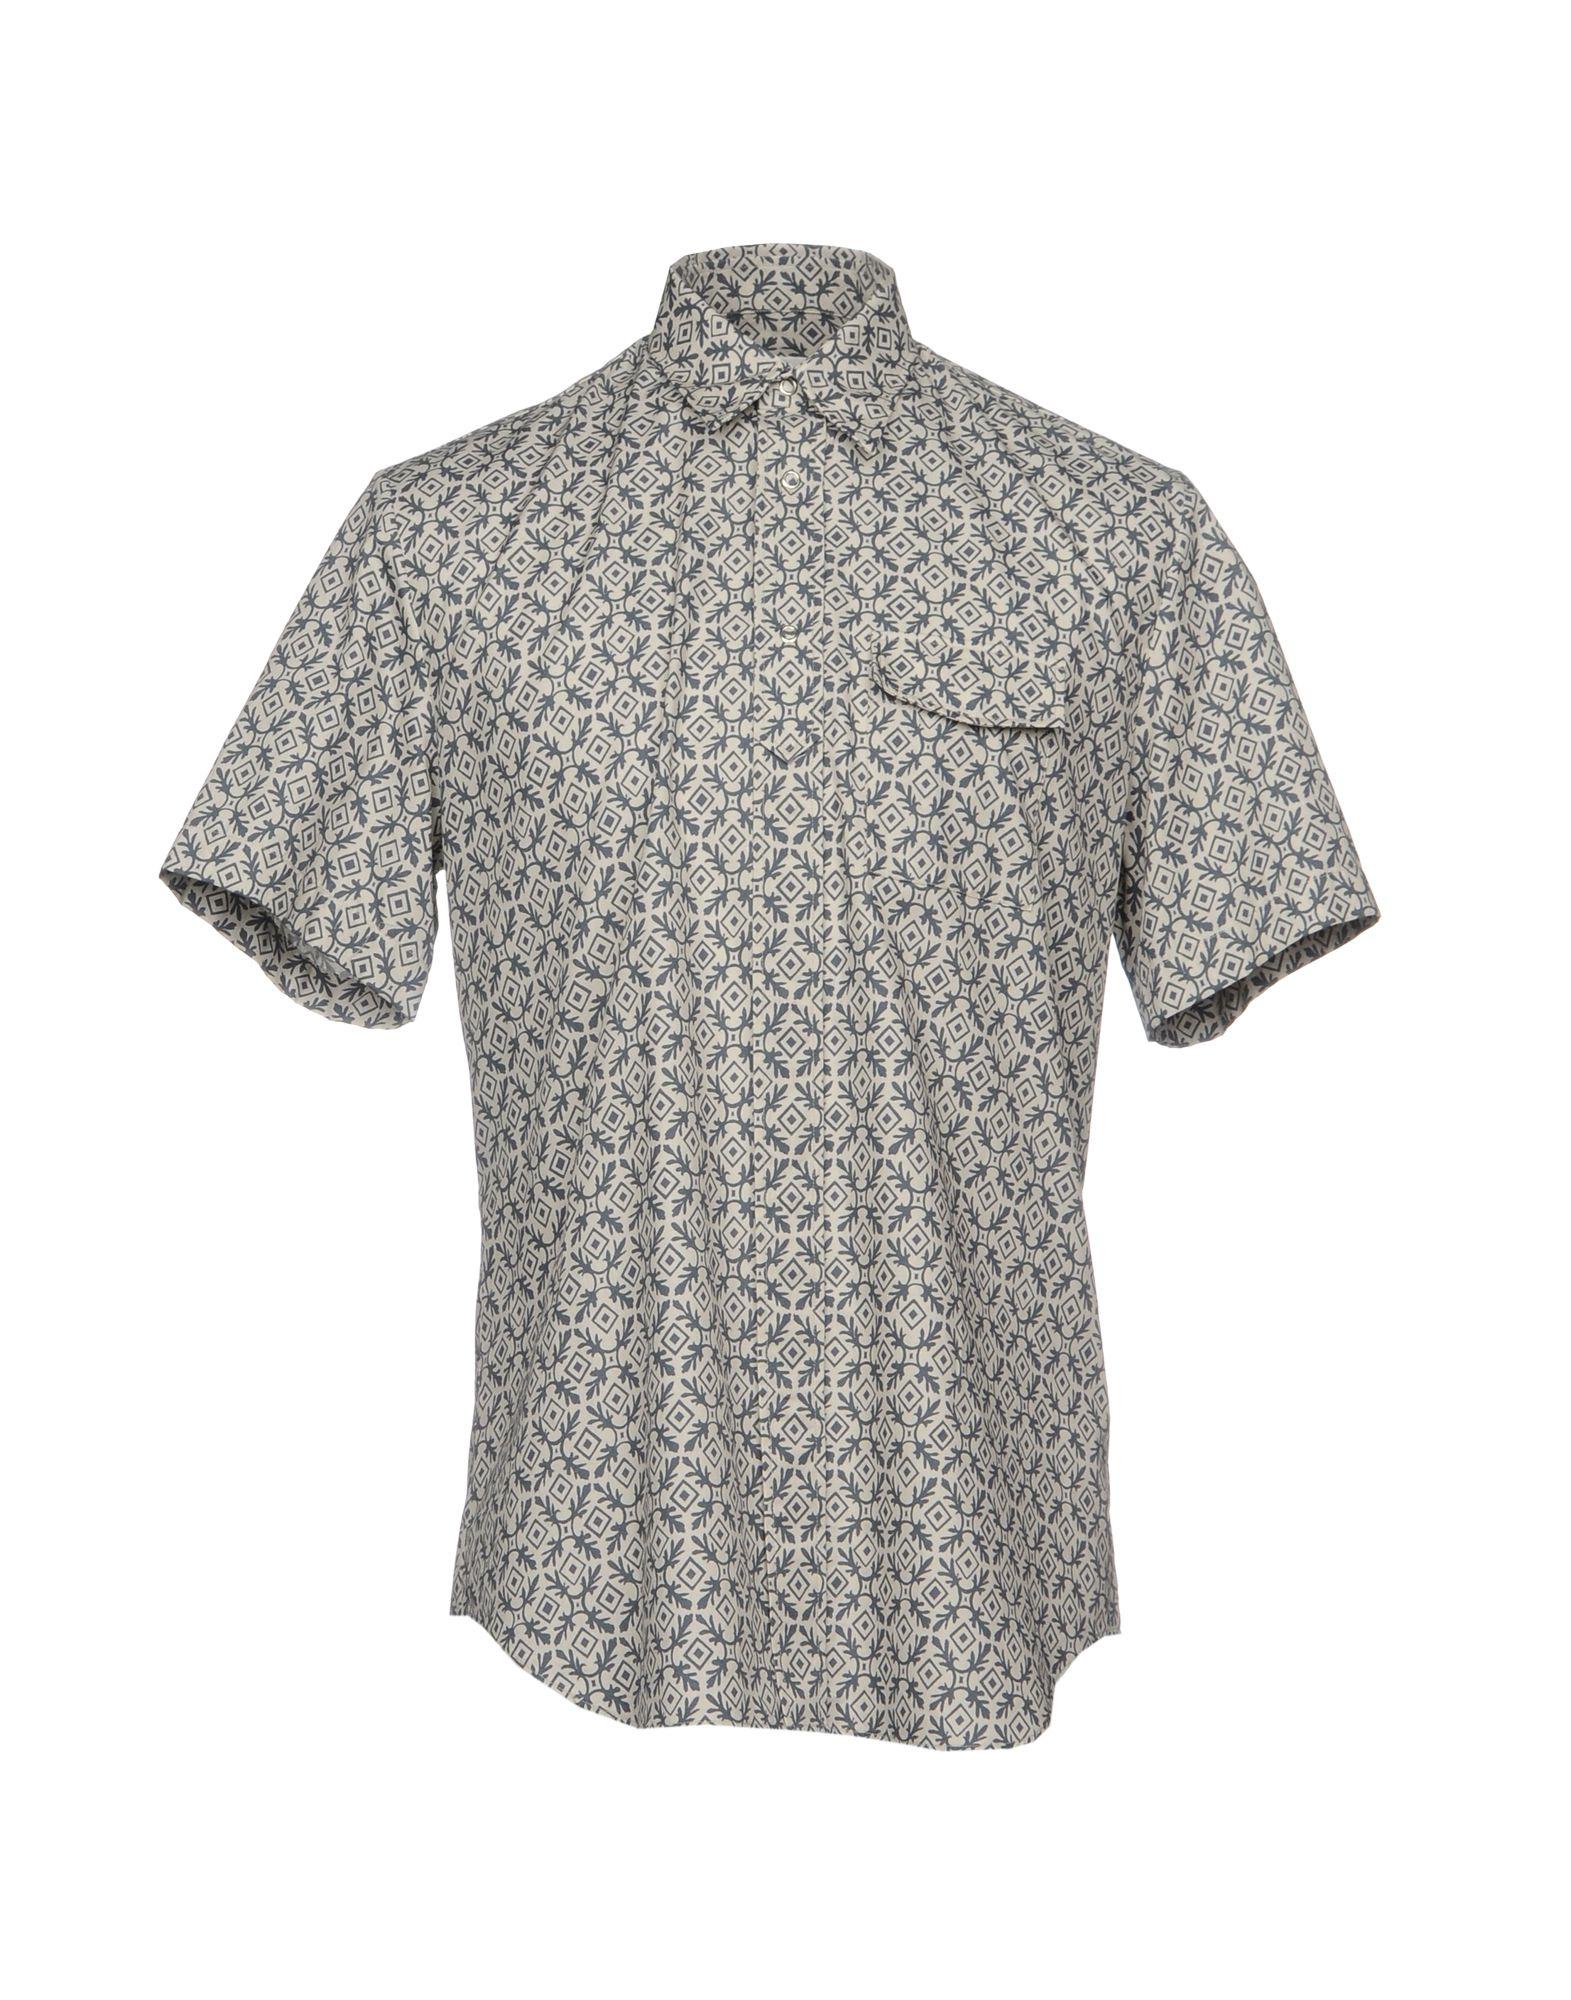 Camicia Fantasia Maison Margiela Uomo - Acquista online su